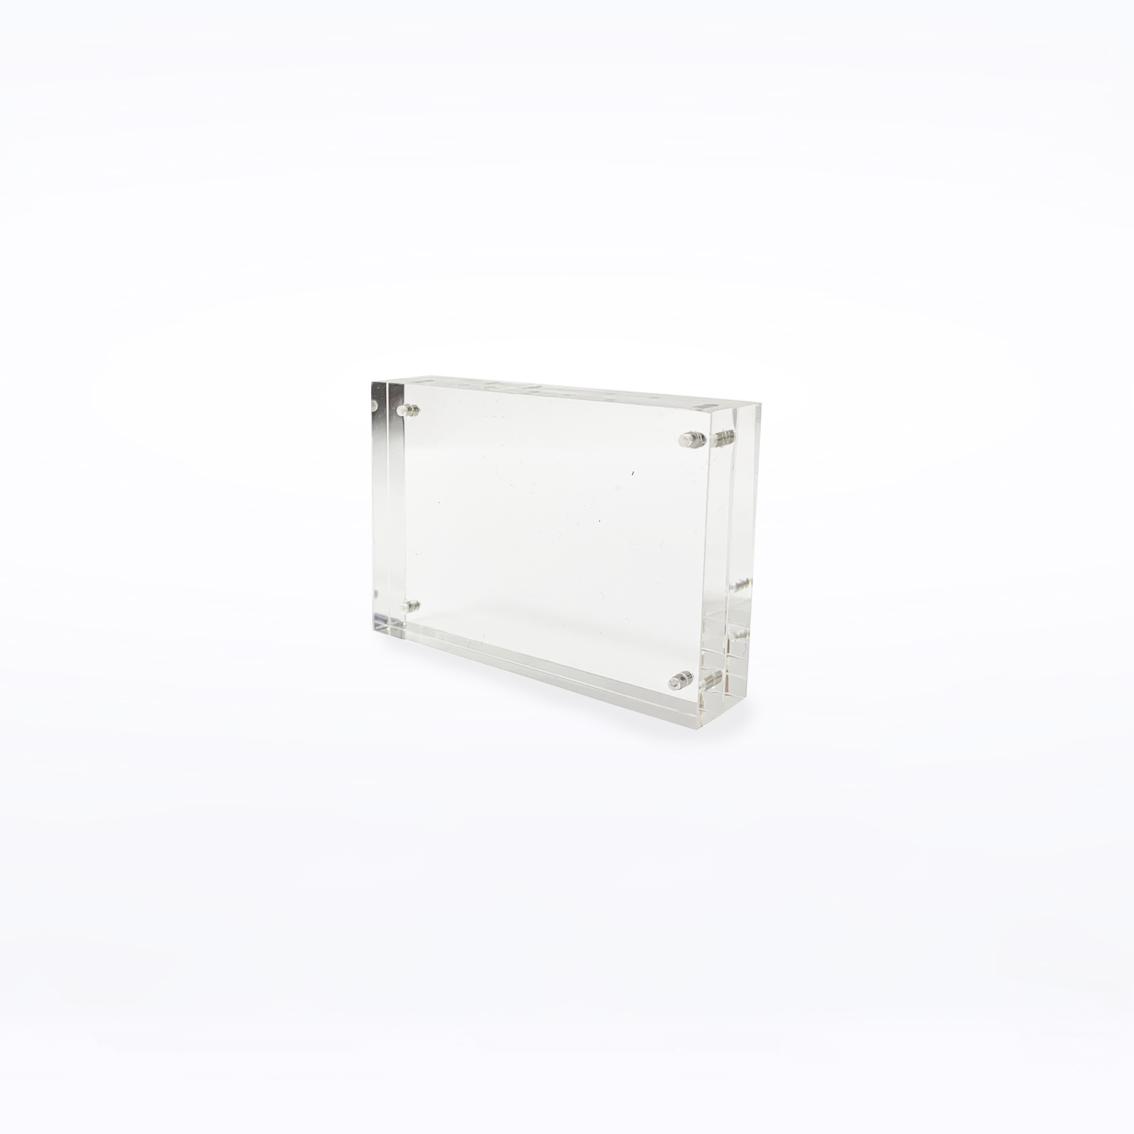 Crystal Block - 45mm x 64mm x 15mm